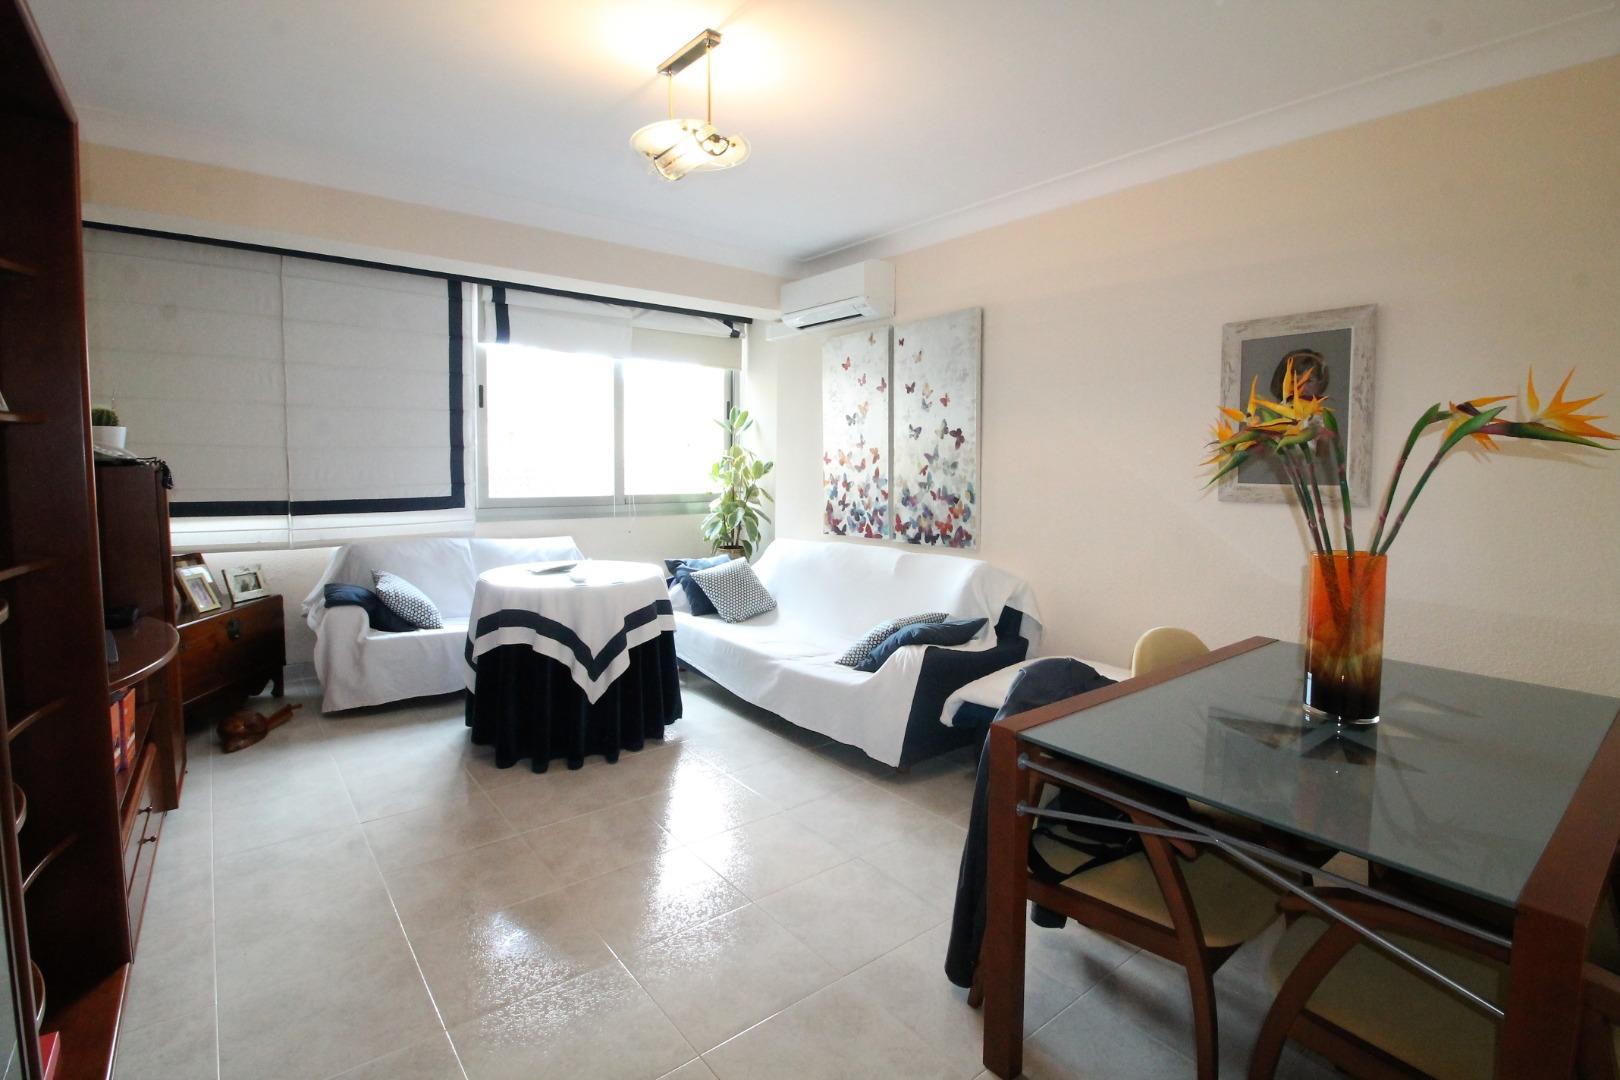 Affitto Appartamento  Carrer santiago rusiñol. Piso 'zona cristo rey'